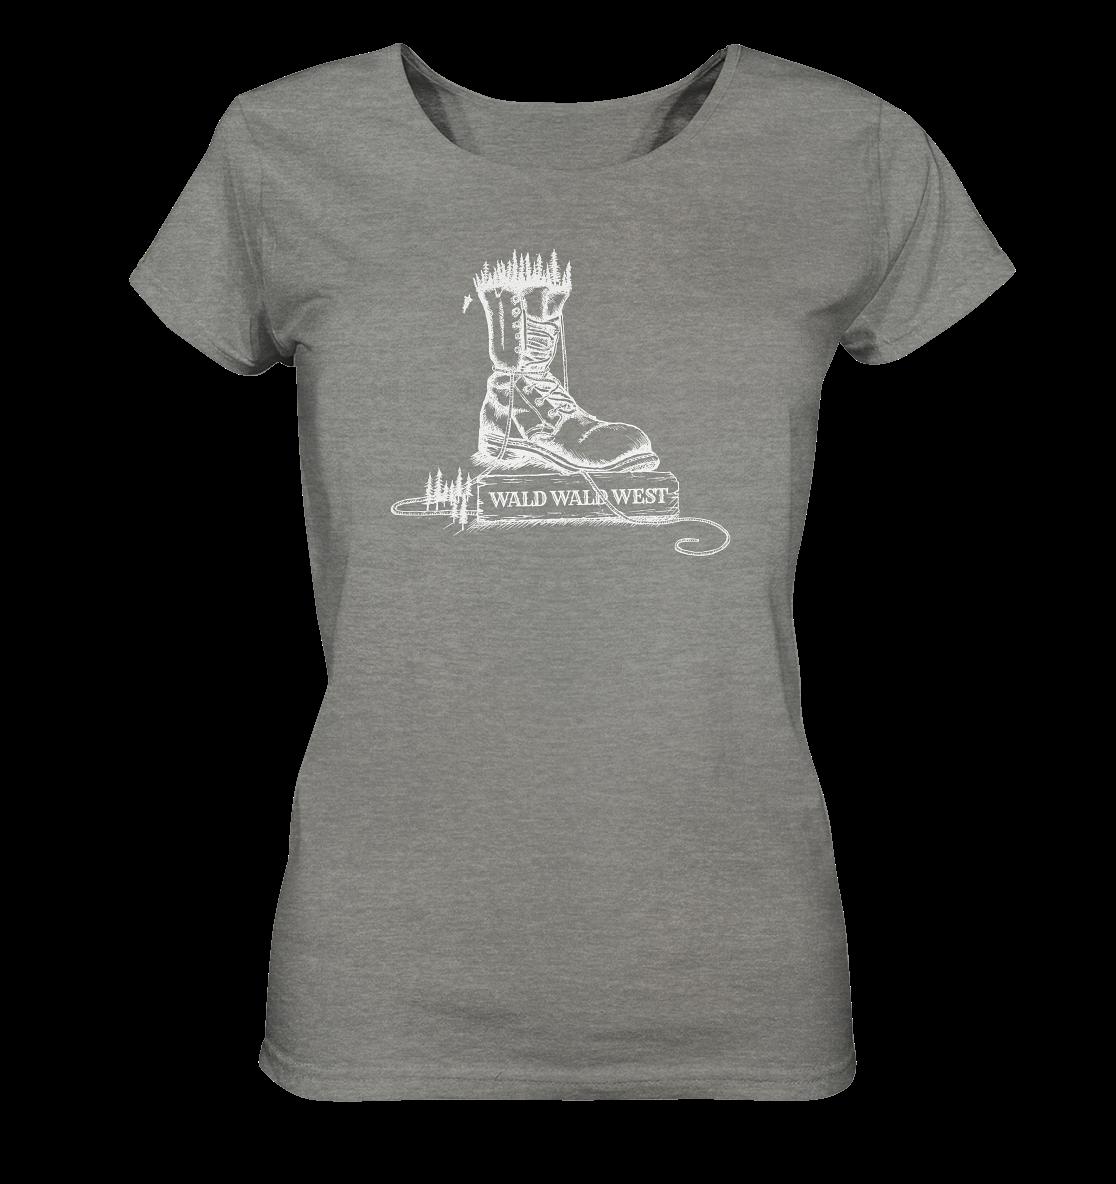 front-ladies-organic-shirt-meliert-818381-1116x.png